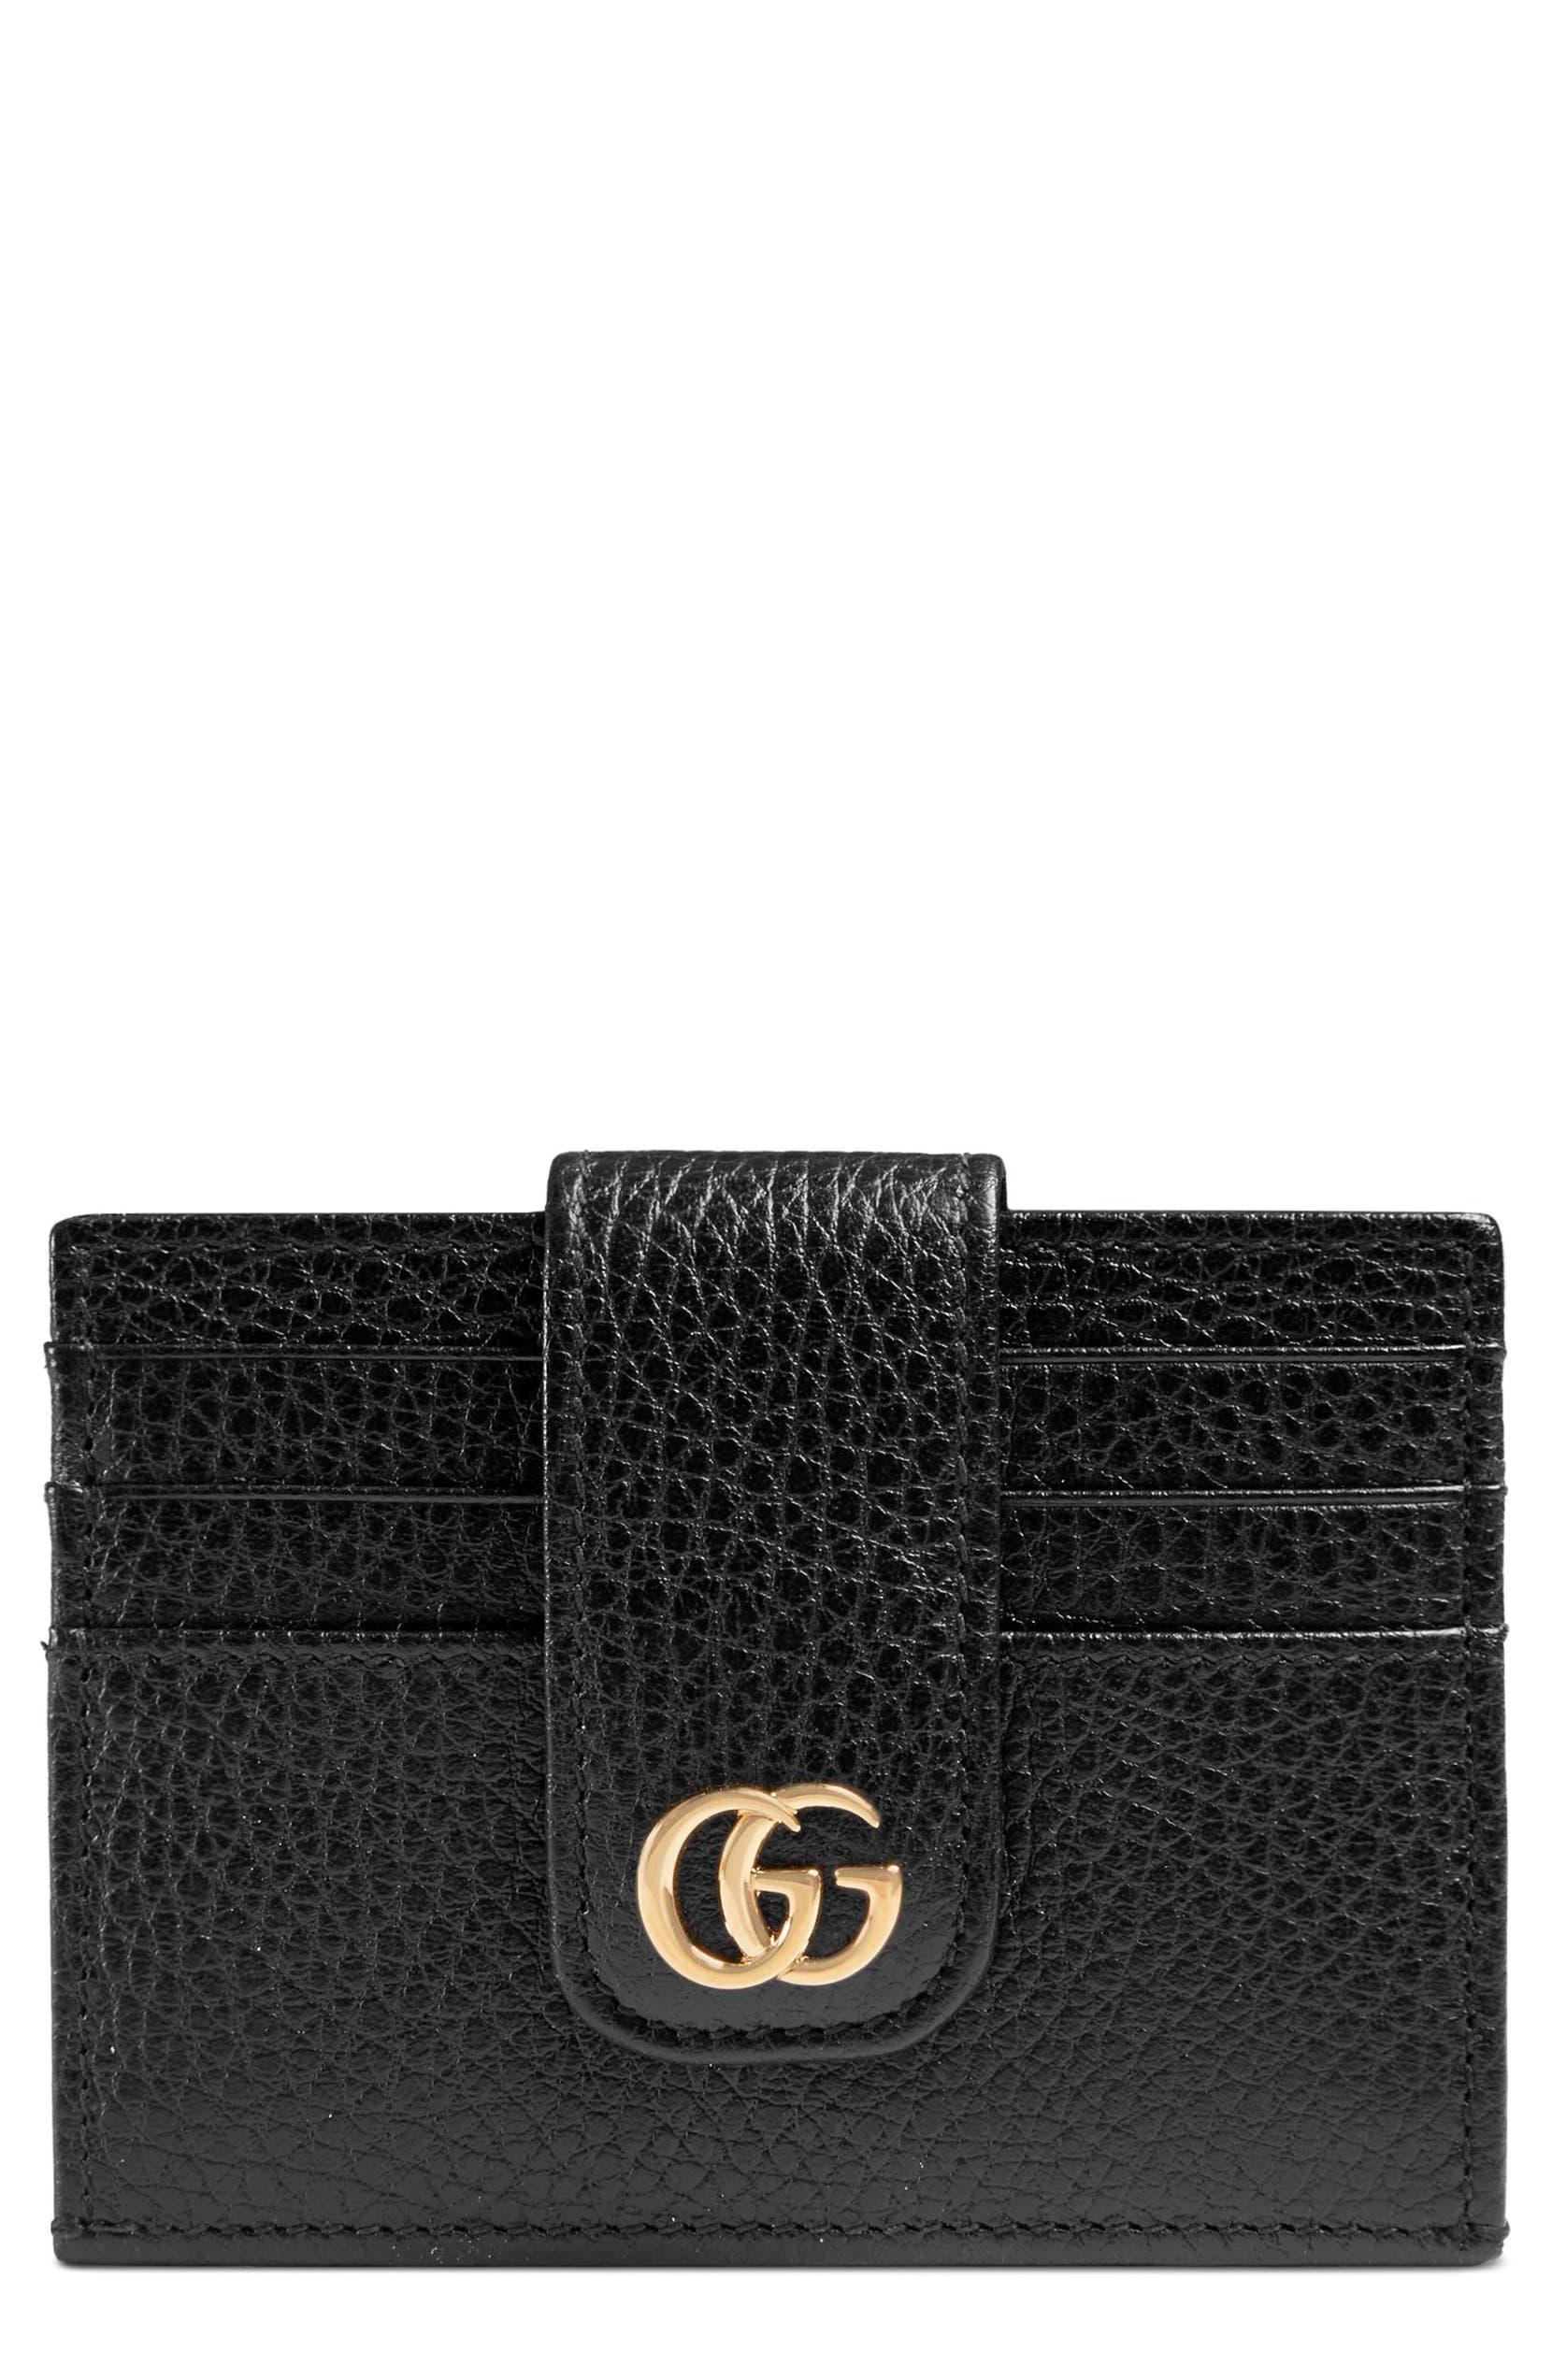 25028e88beb102 Gucci GG Marmont Leather Card Case | Nordstrom